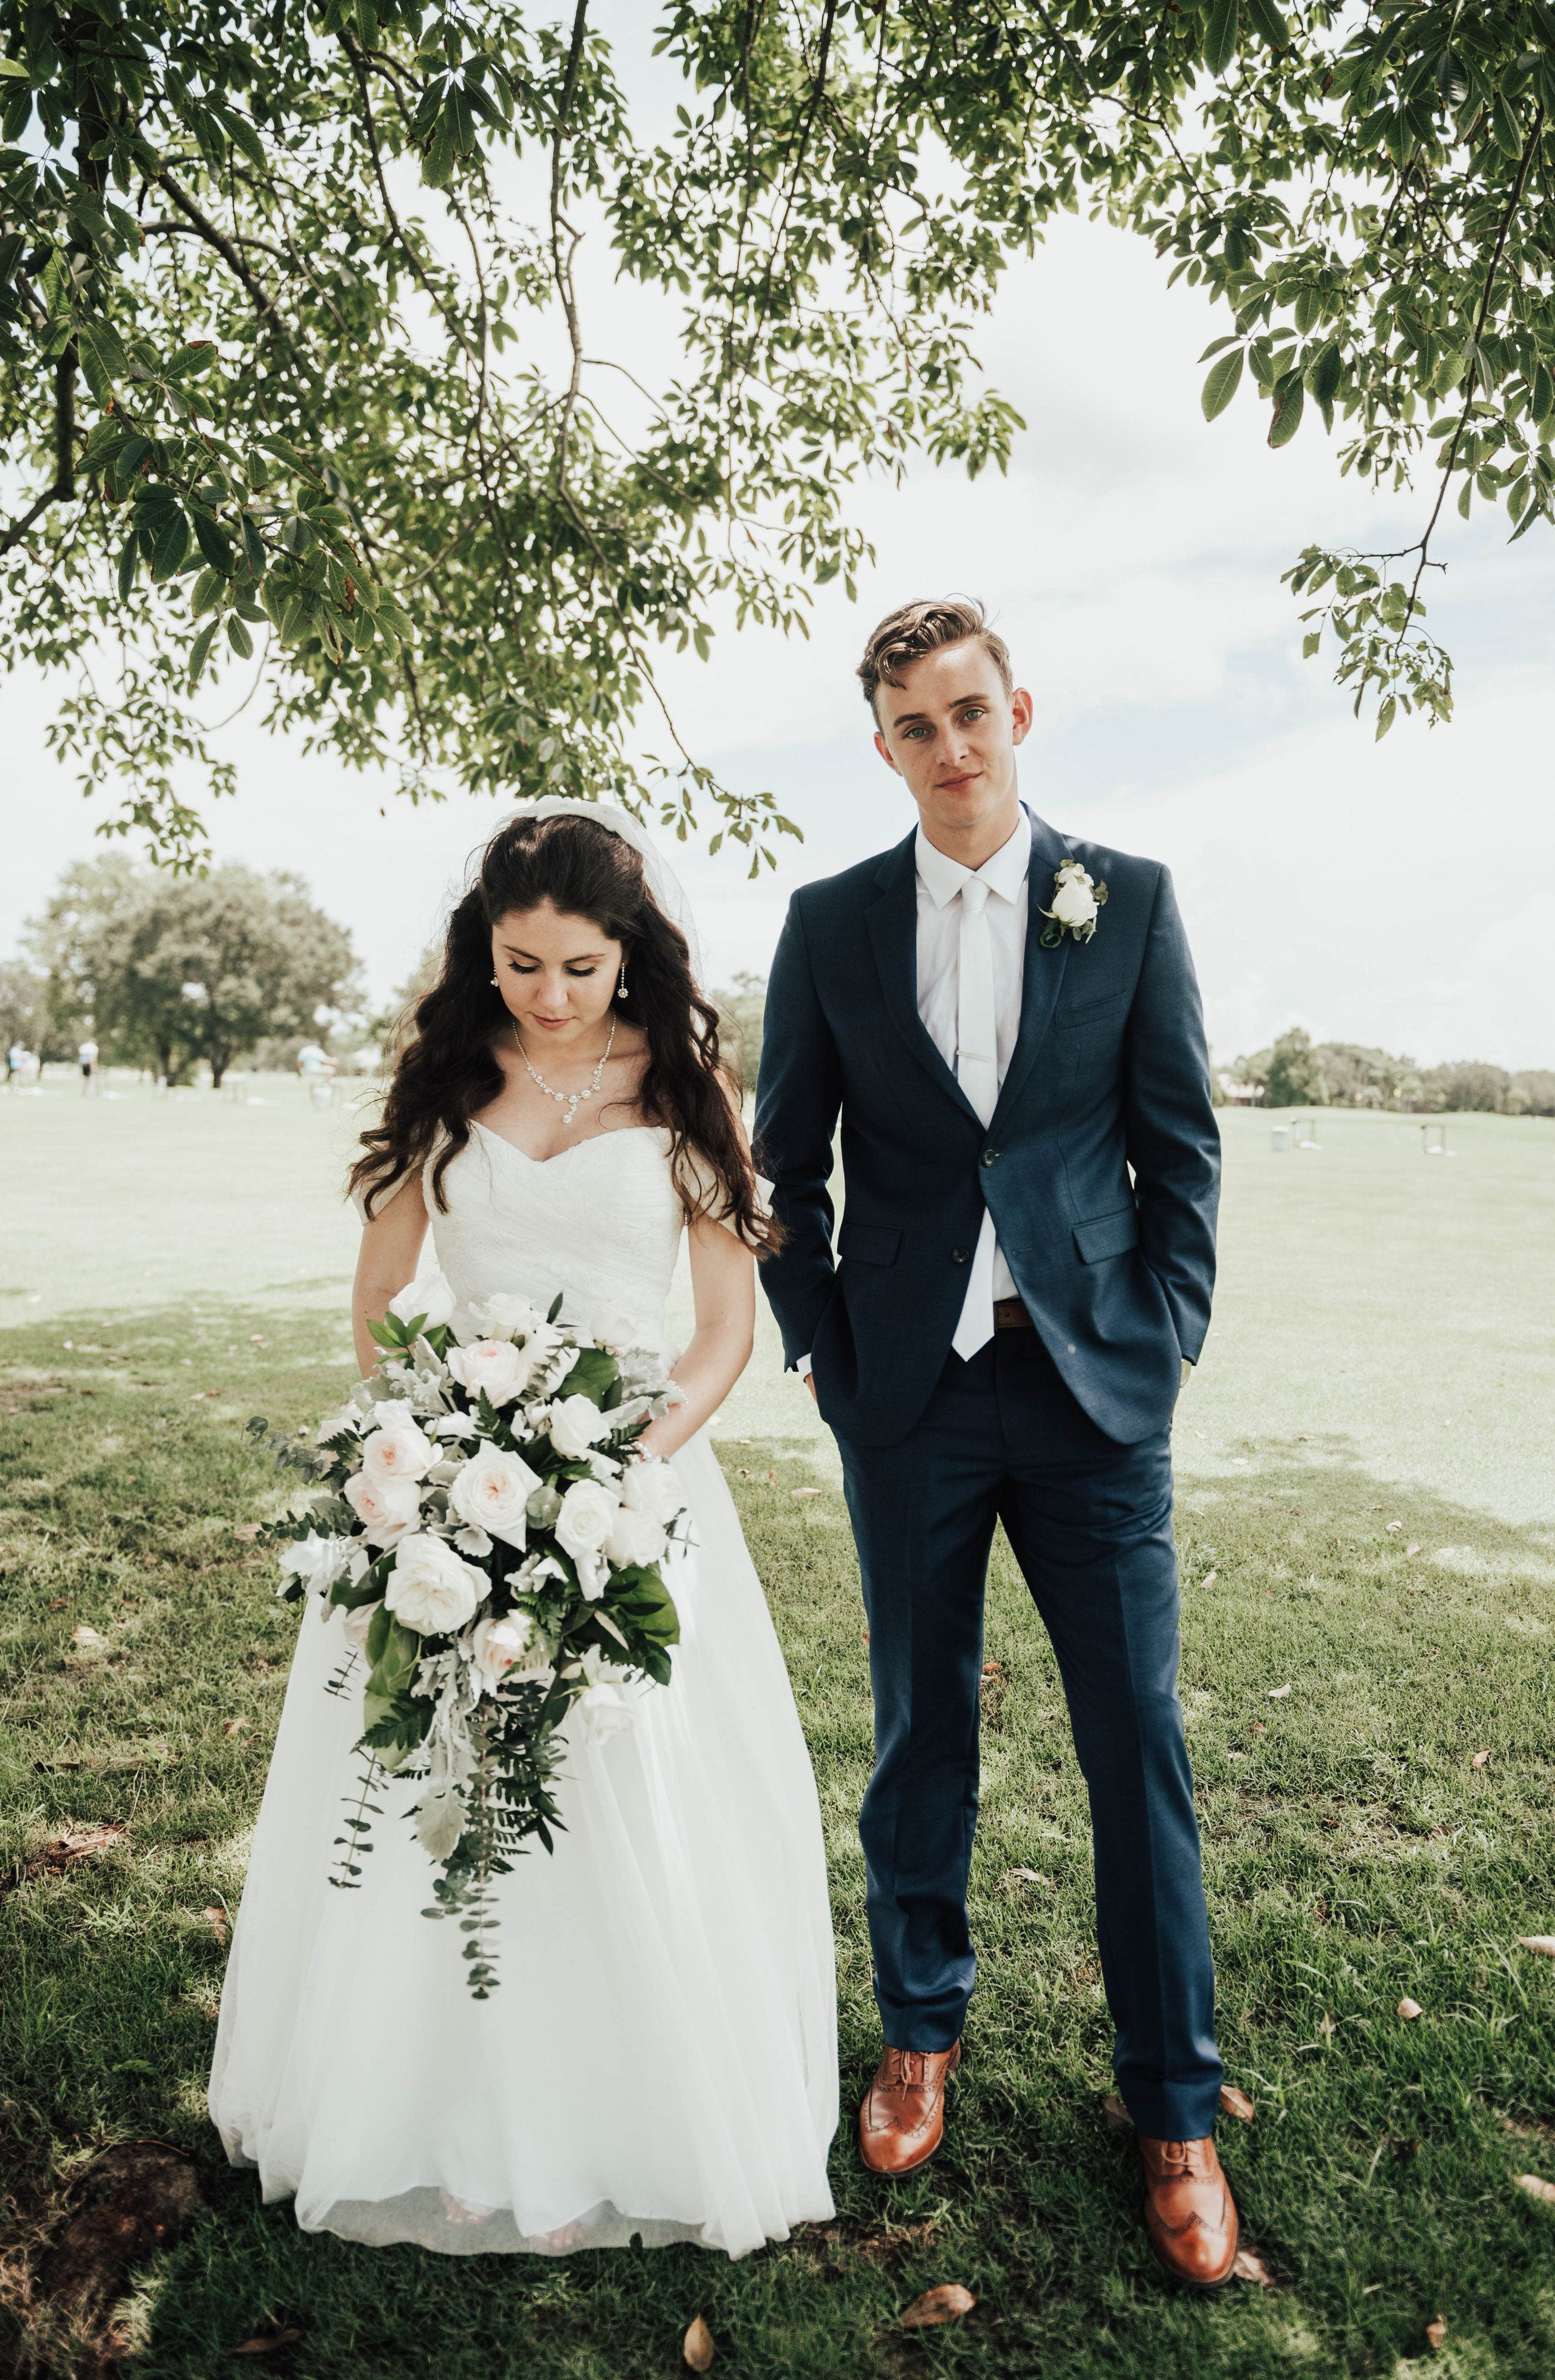 Off The Shoulder Bridal Gown Bride Groom Photo Navy Groom Bride Groom Photos Bridal Gowns Navy Blue Groom [ 4000 x 2614 Pixel ]